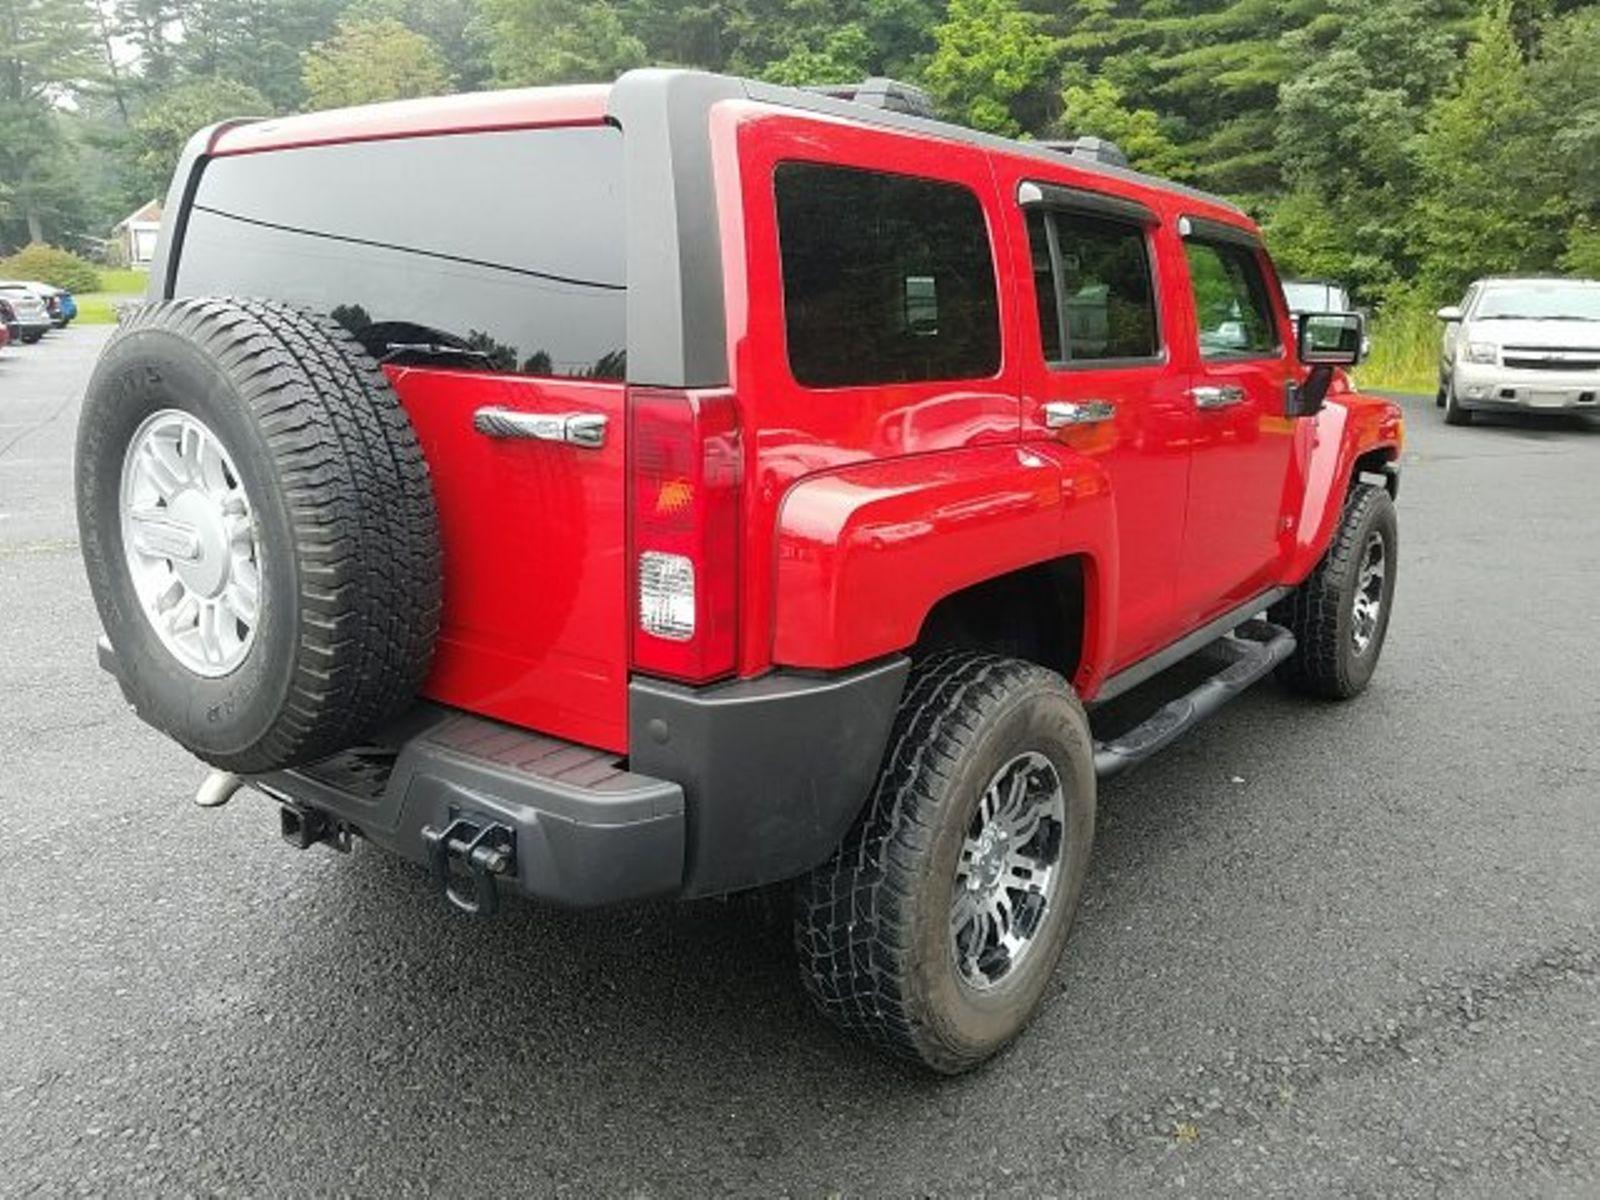 2008 Hummer H3 SUV Pine Grove PA Pine Grove Auto Sales